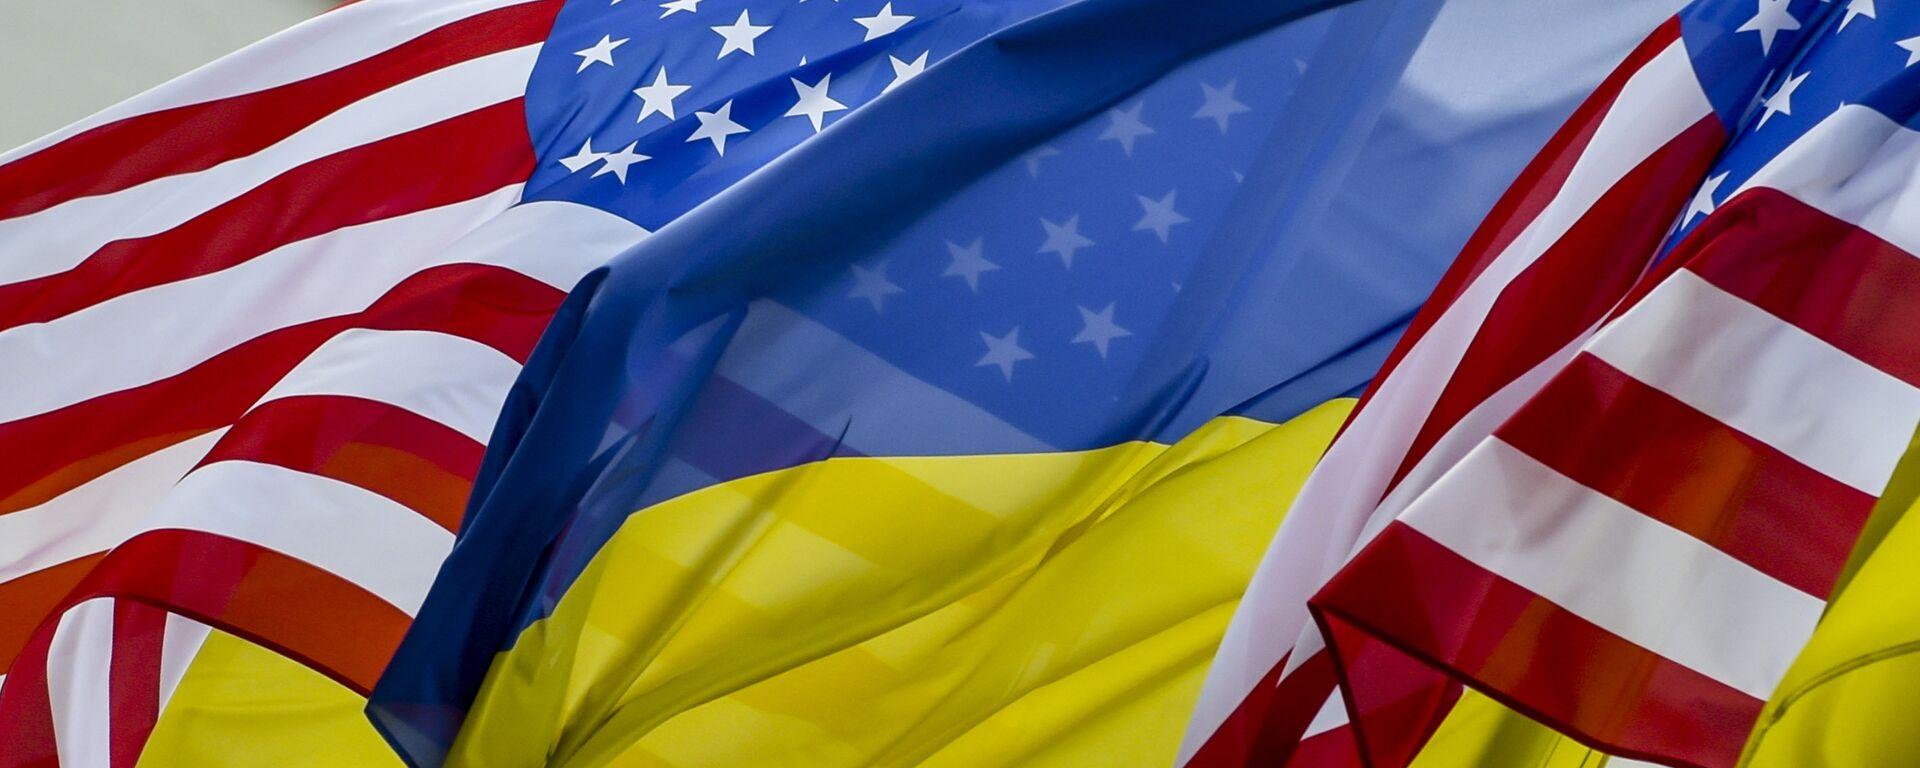 Флаги США и Украины - Sputnik Latvija, 1920, 18.05.2021